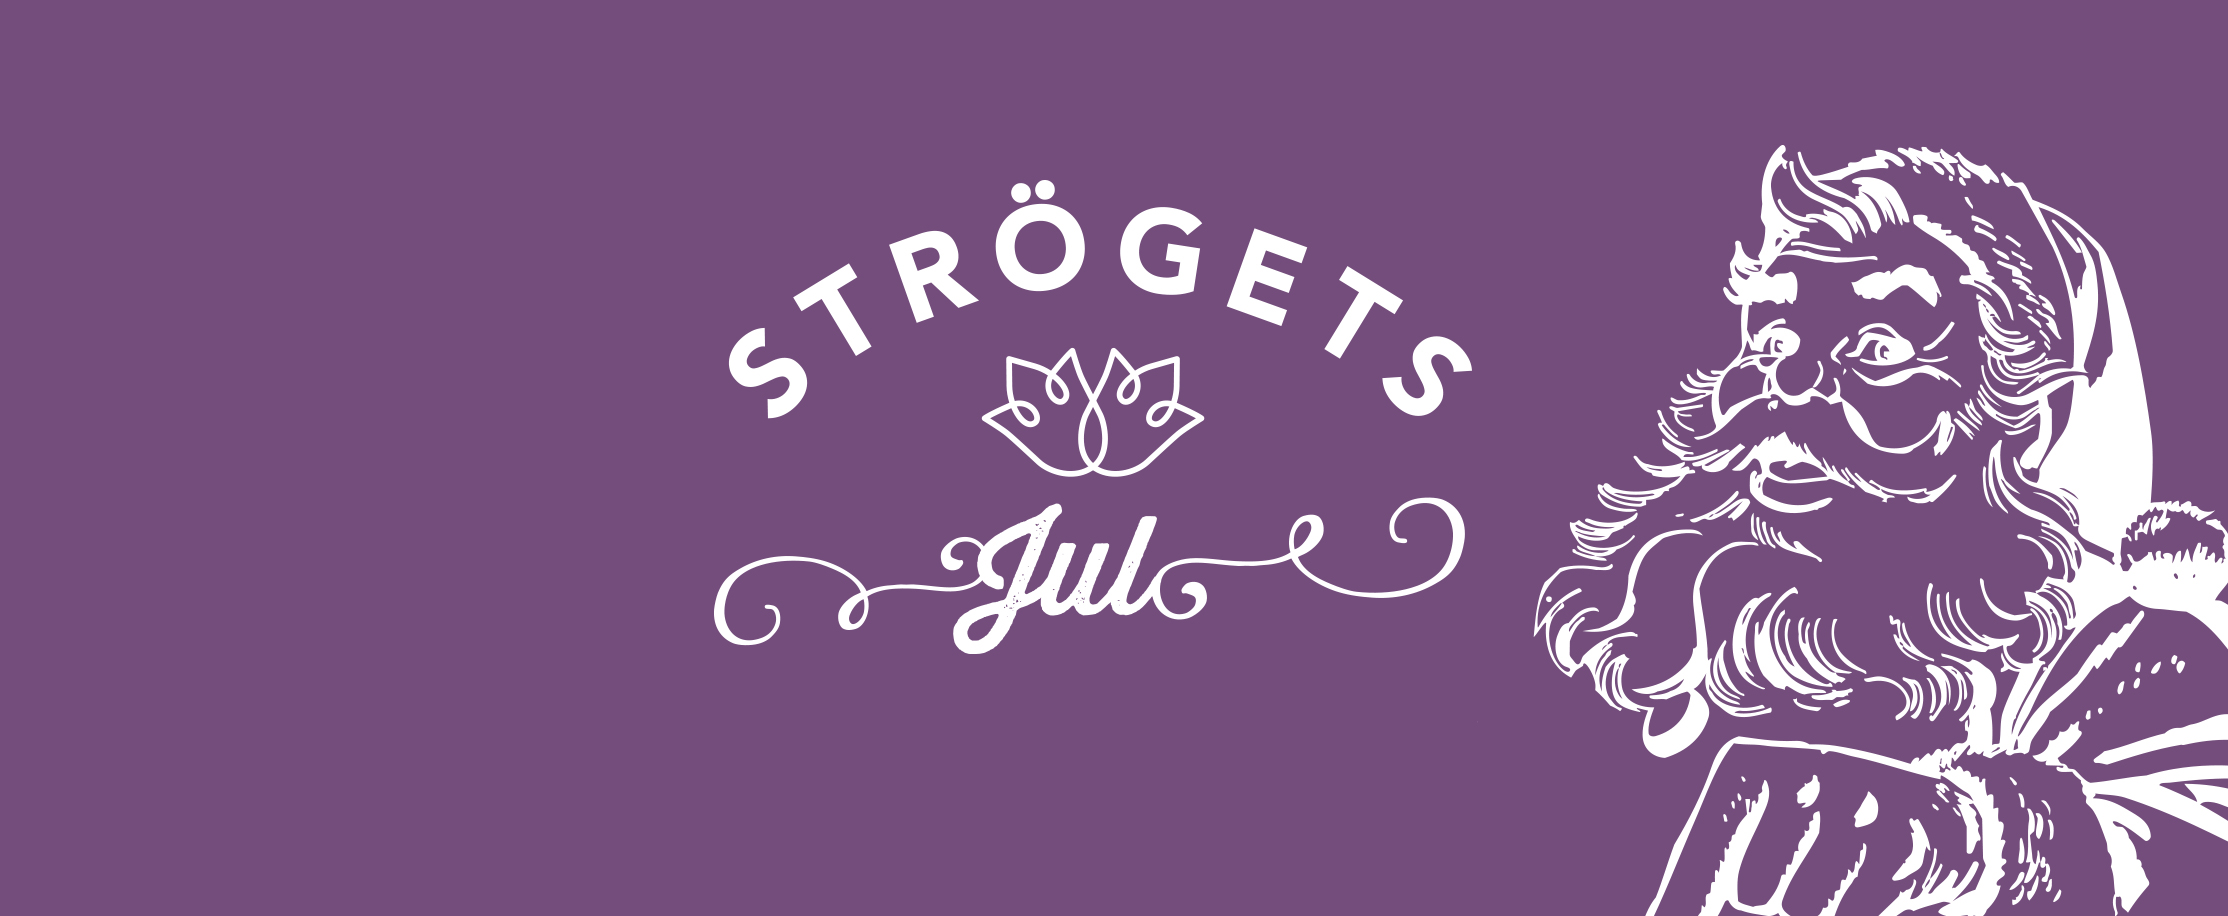 STROGETSJUL_banner_sida